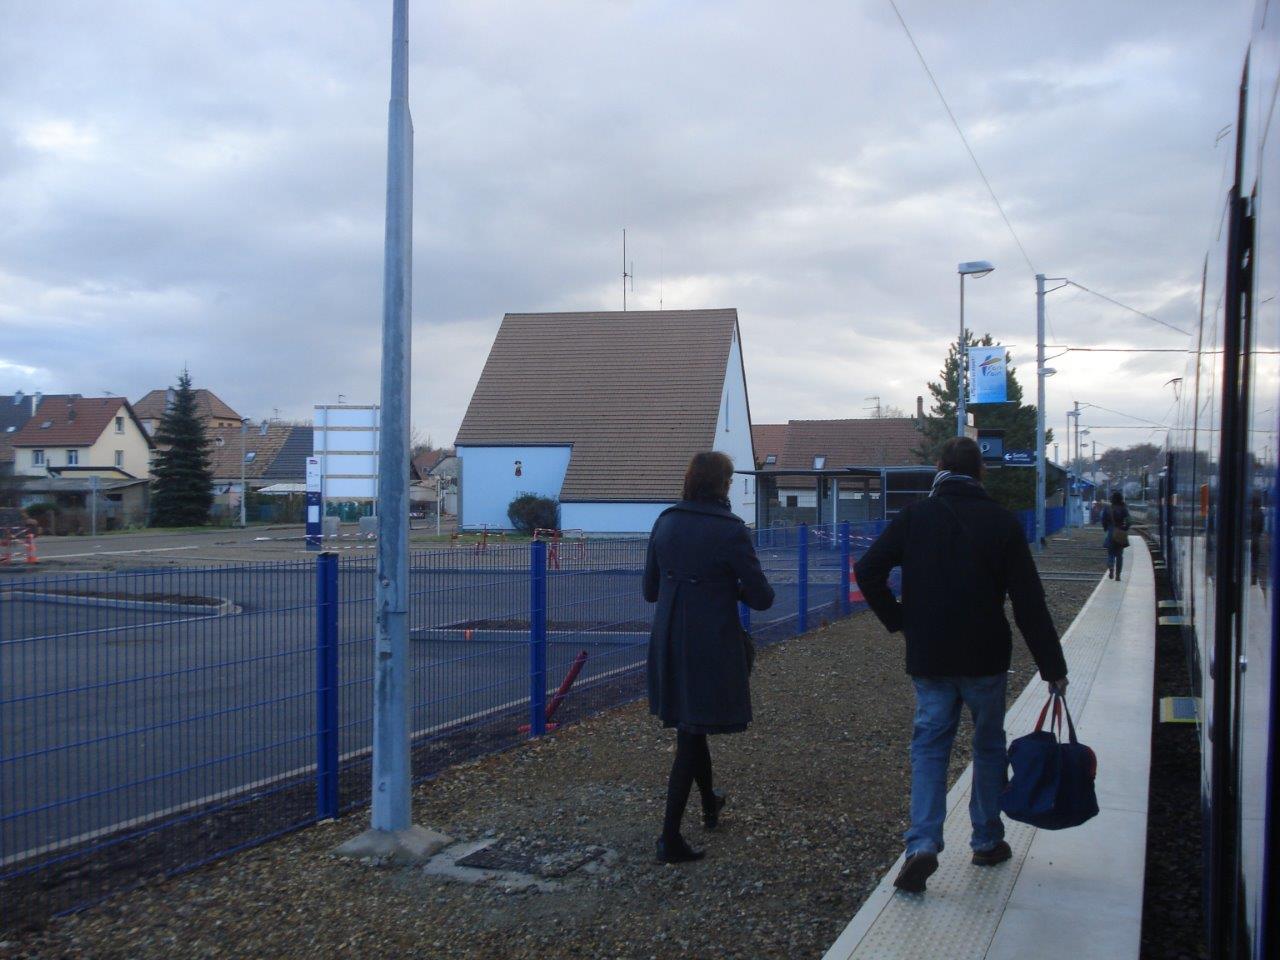 gare-de-vieux-thann-train-station